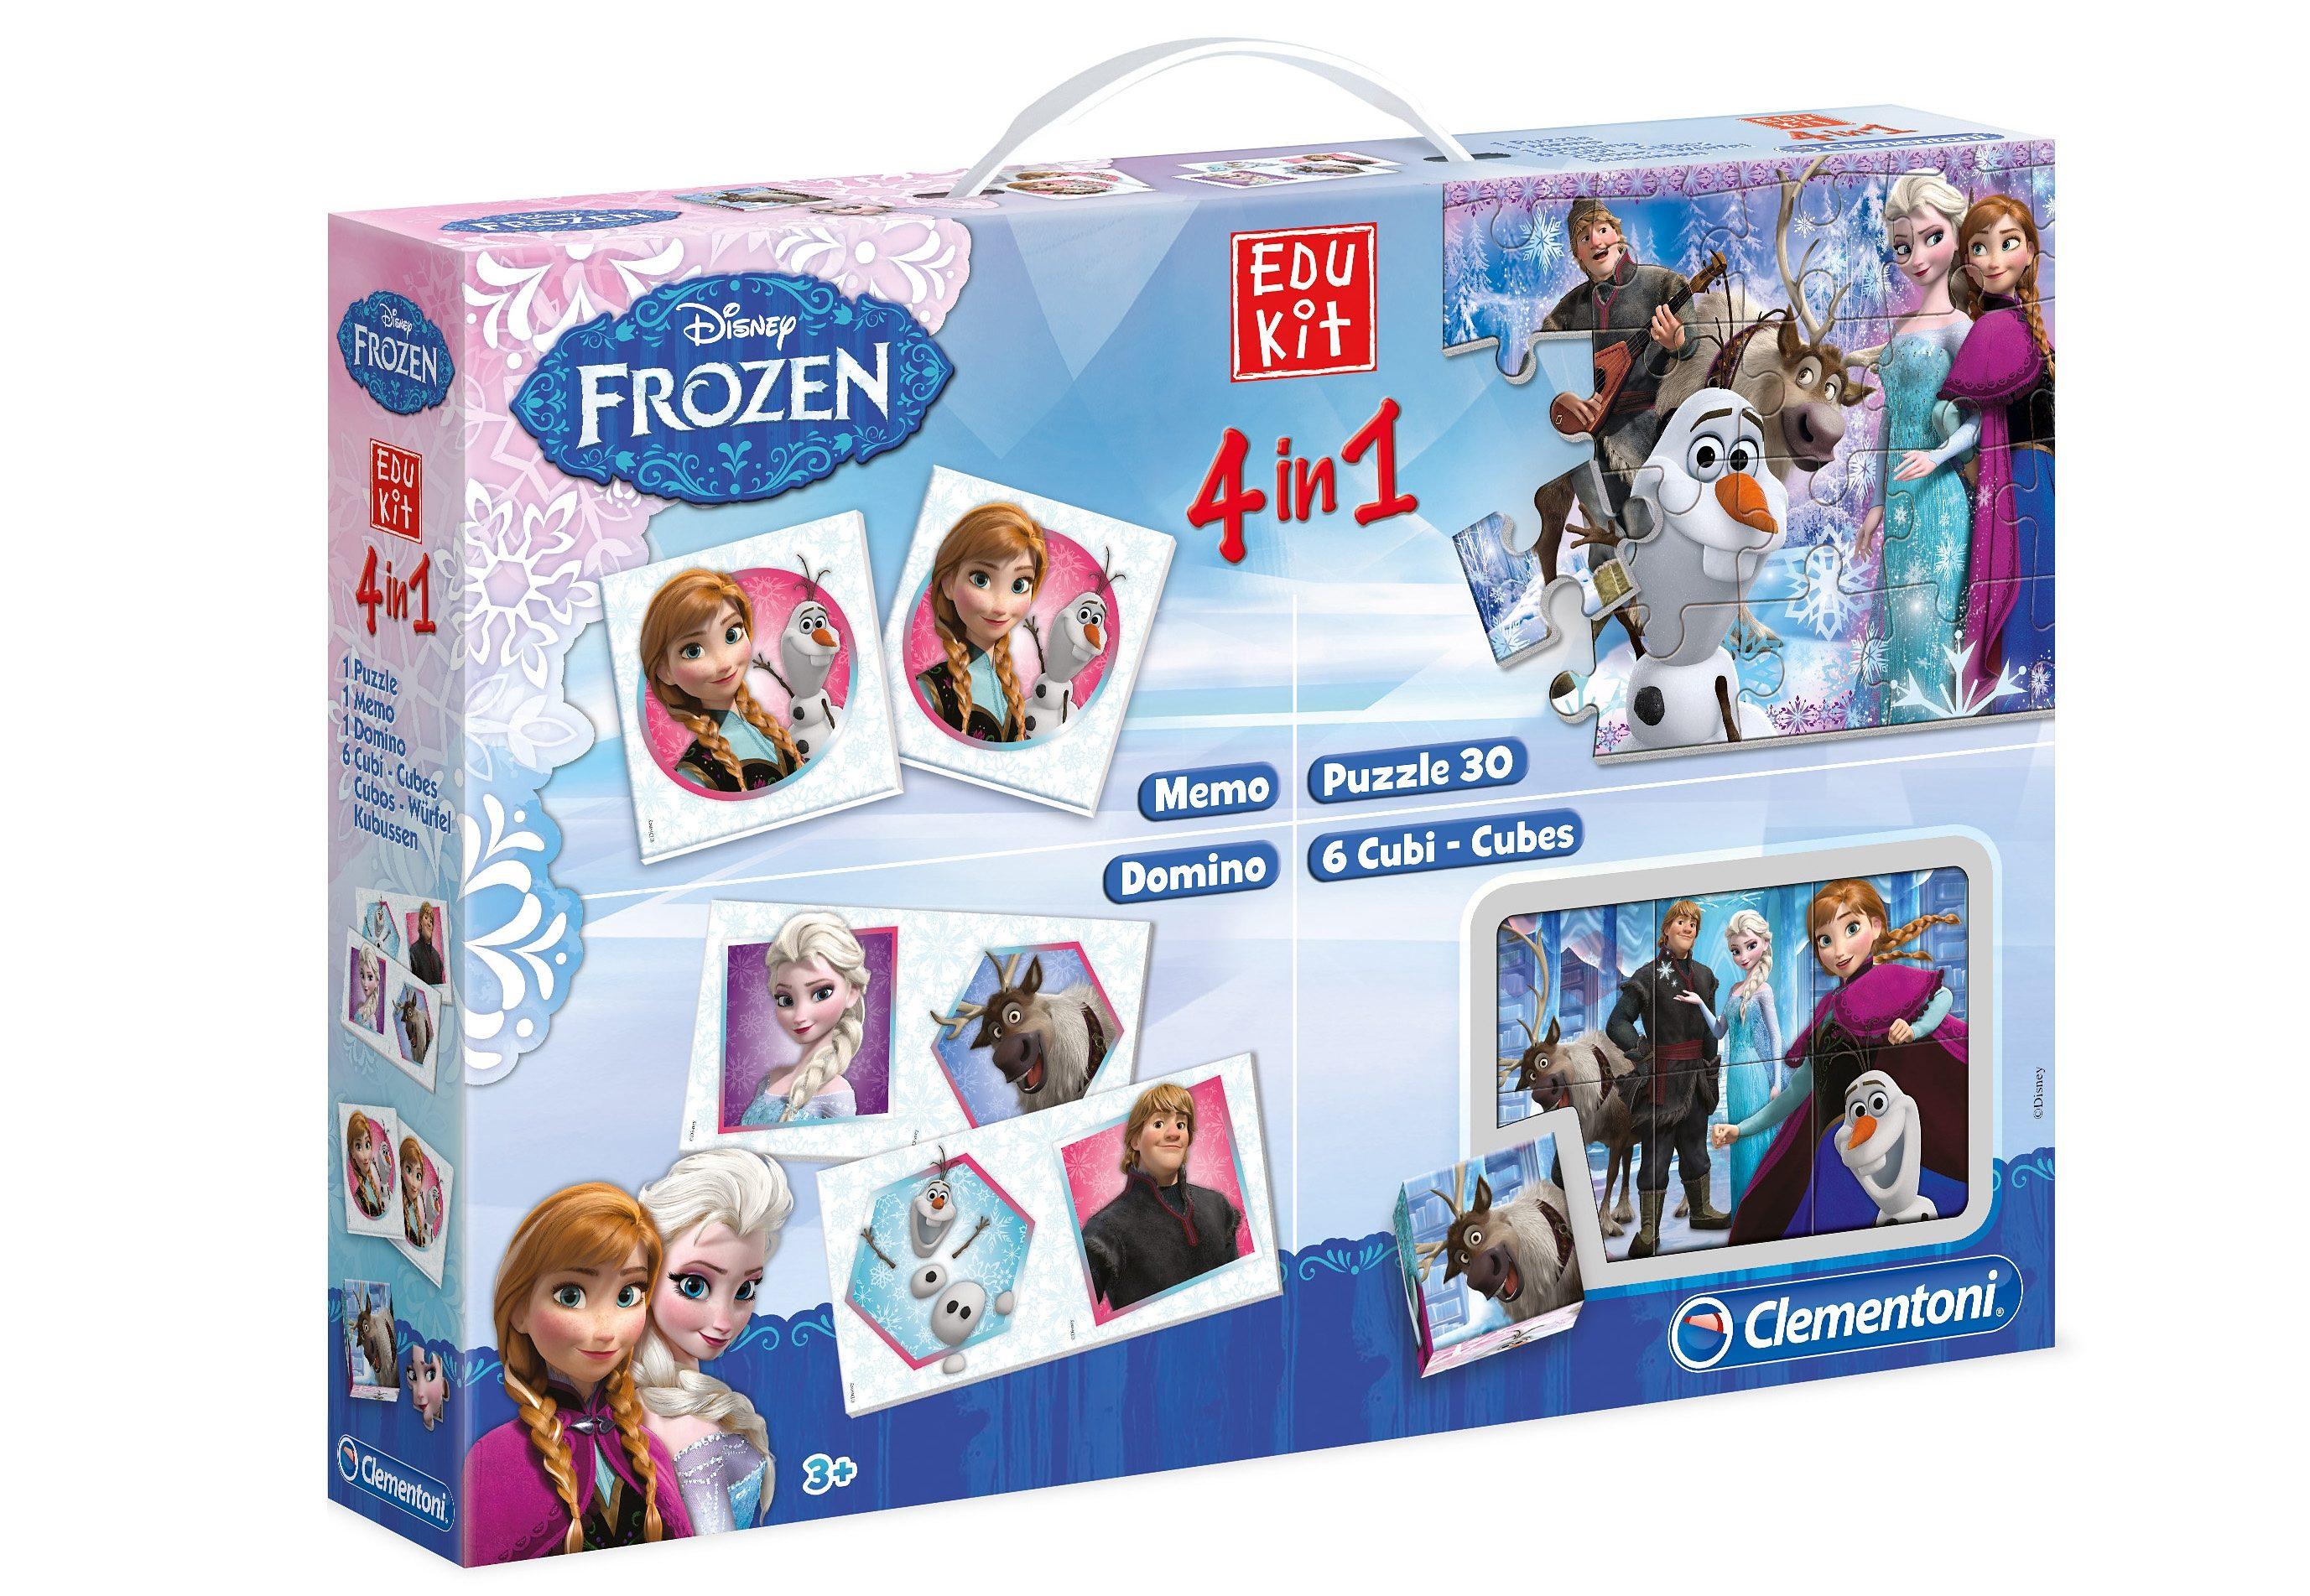 Clementoni Spieleset, »Edukit 4in1 - Disney Frozen«